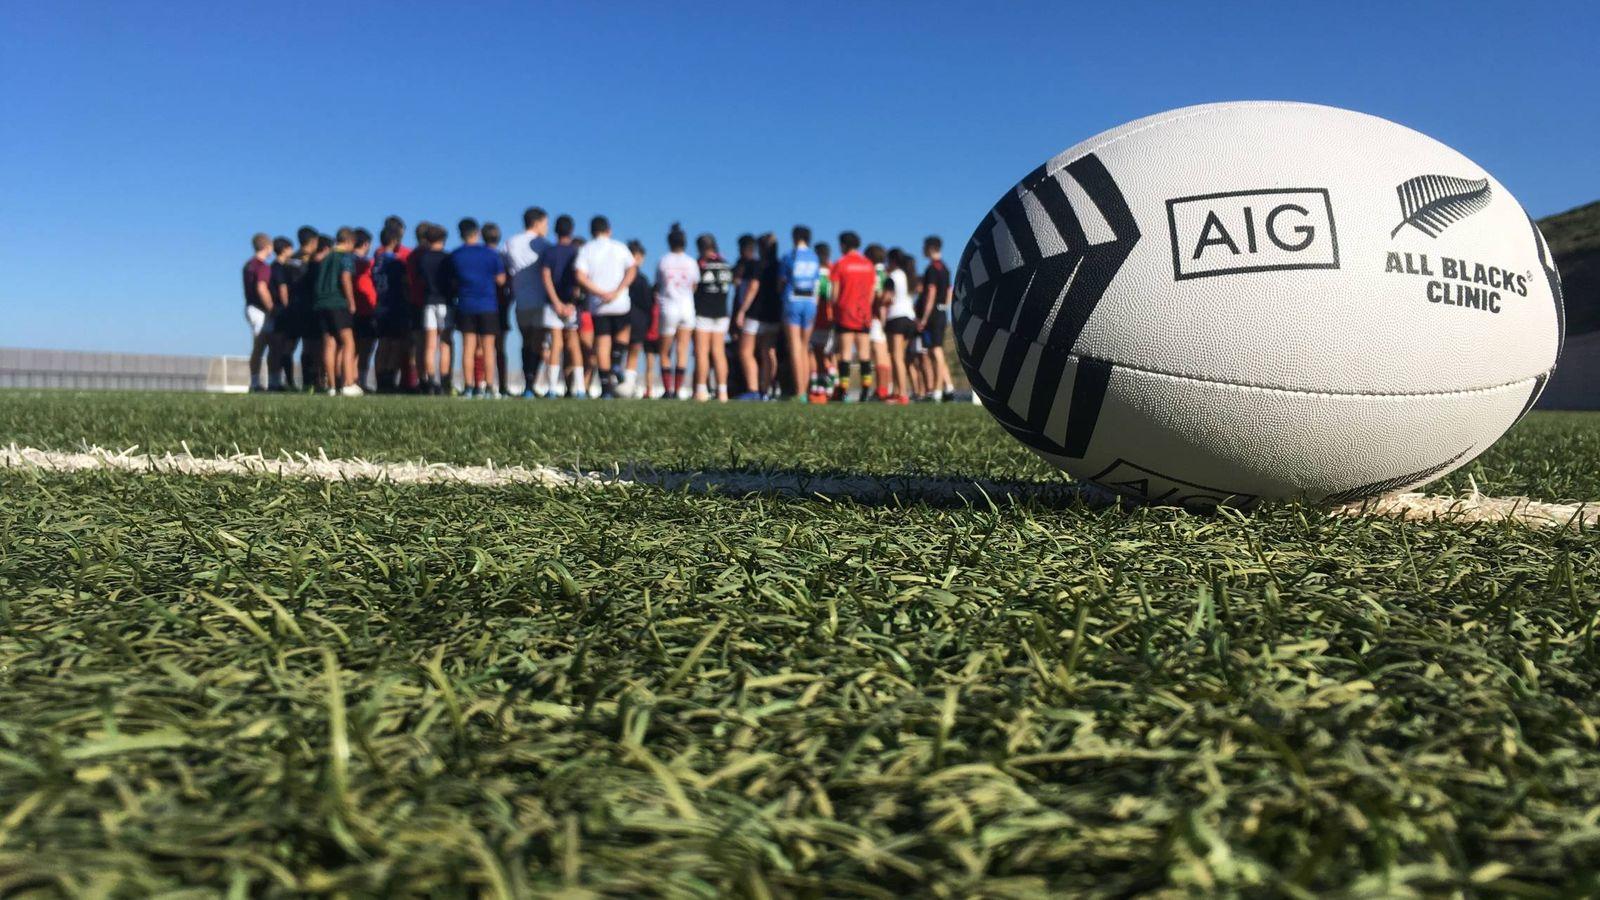 Foto: Los All Blacks visitaron Granada para impartir un clínic junto a la empresa Kiwi Sports.